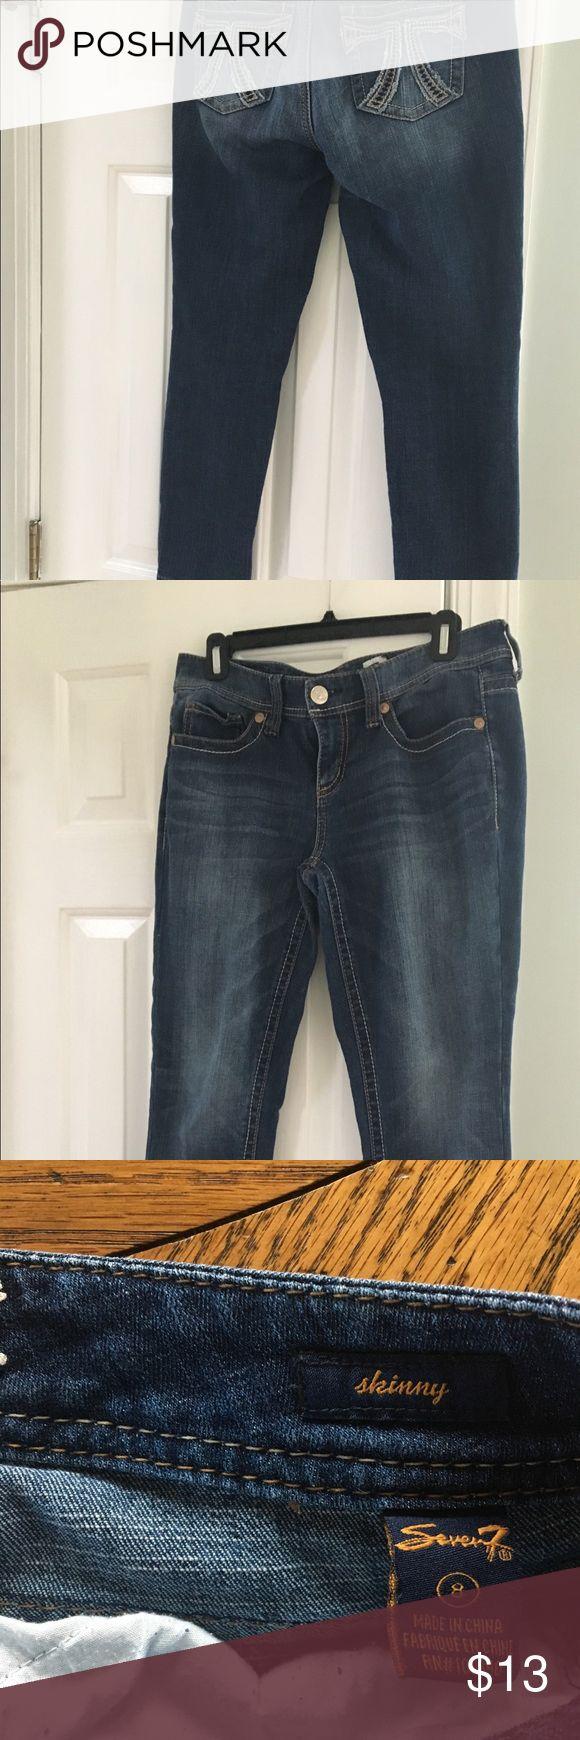 Seven jeans skinny size 8 Skinny sevens Seven7 Jeans Skinny